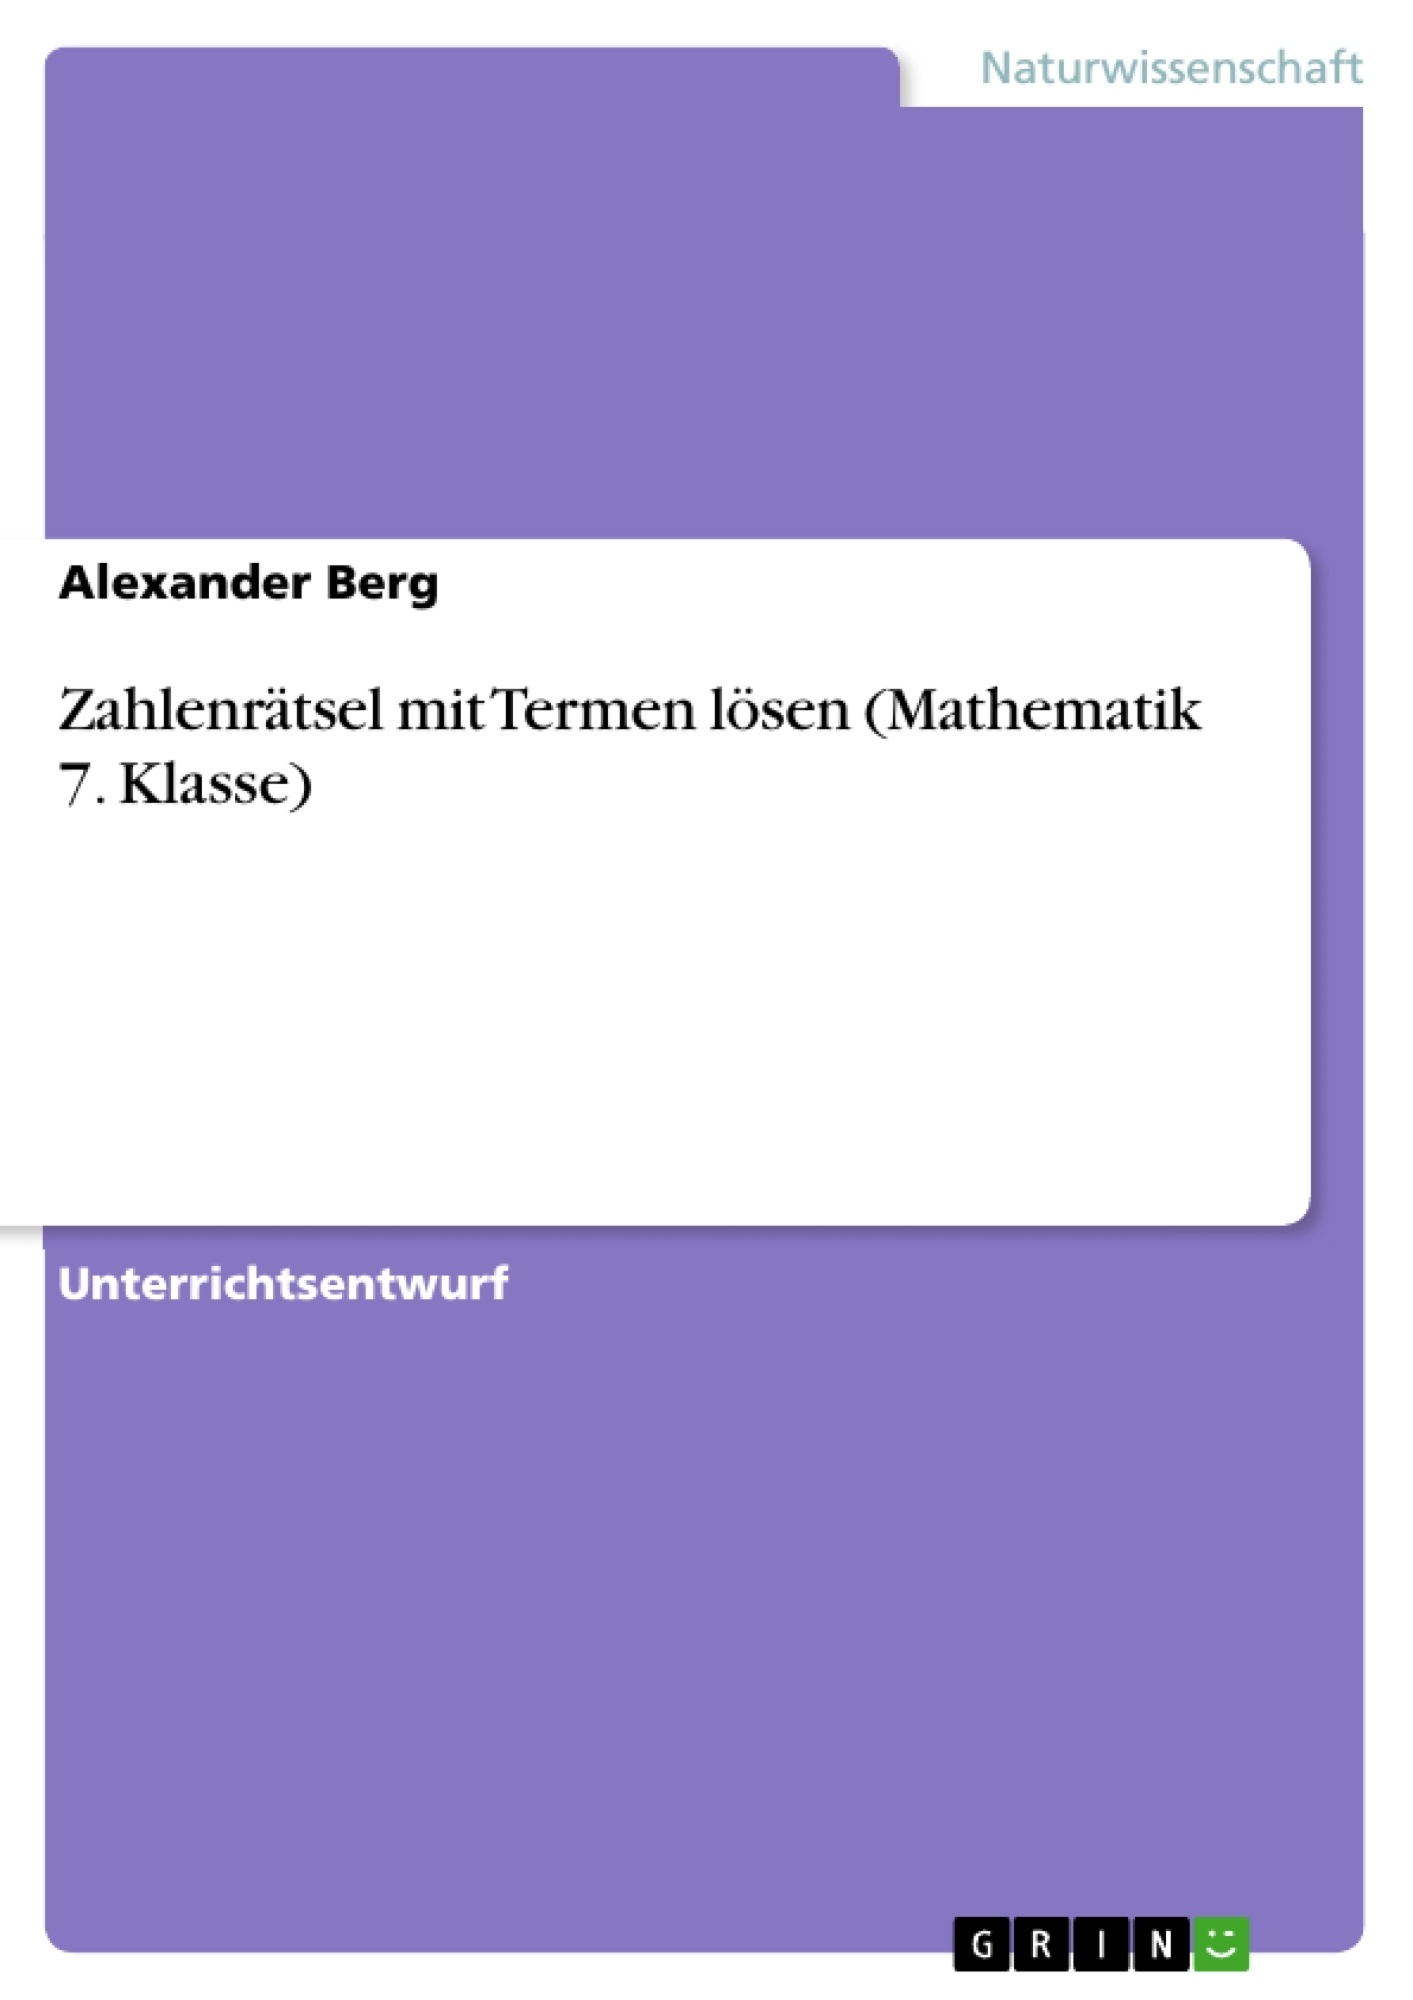 Titel: Zahlenrätsel mit Termen lösen (Mathematik 7. Klasse)